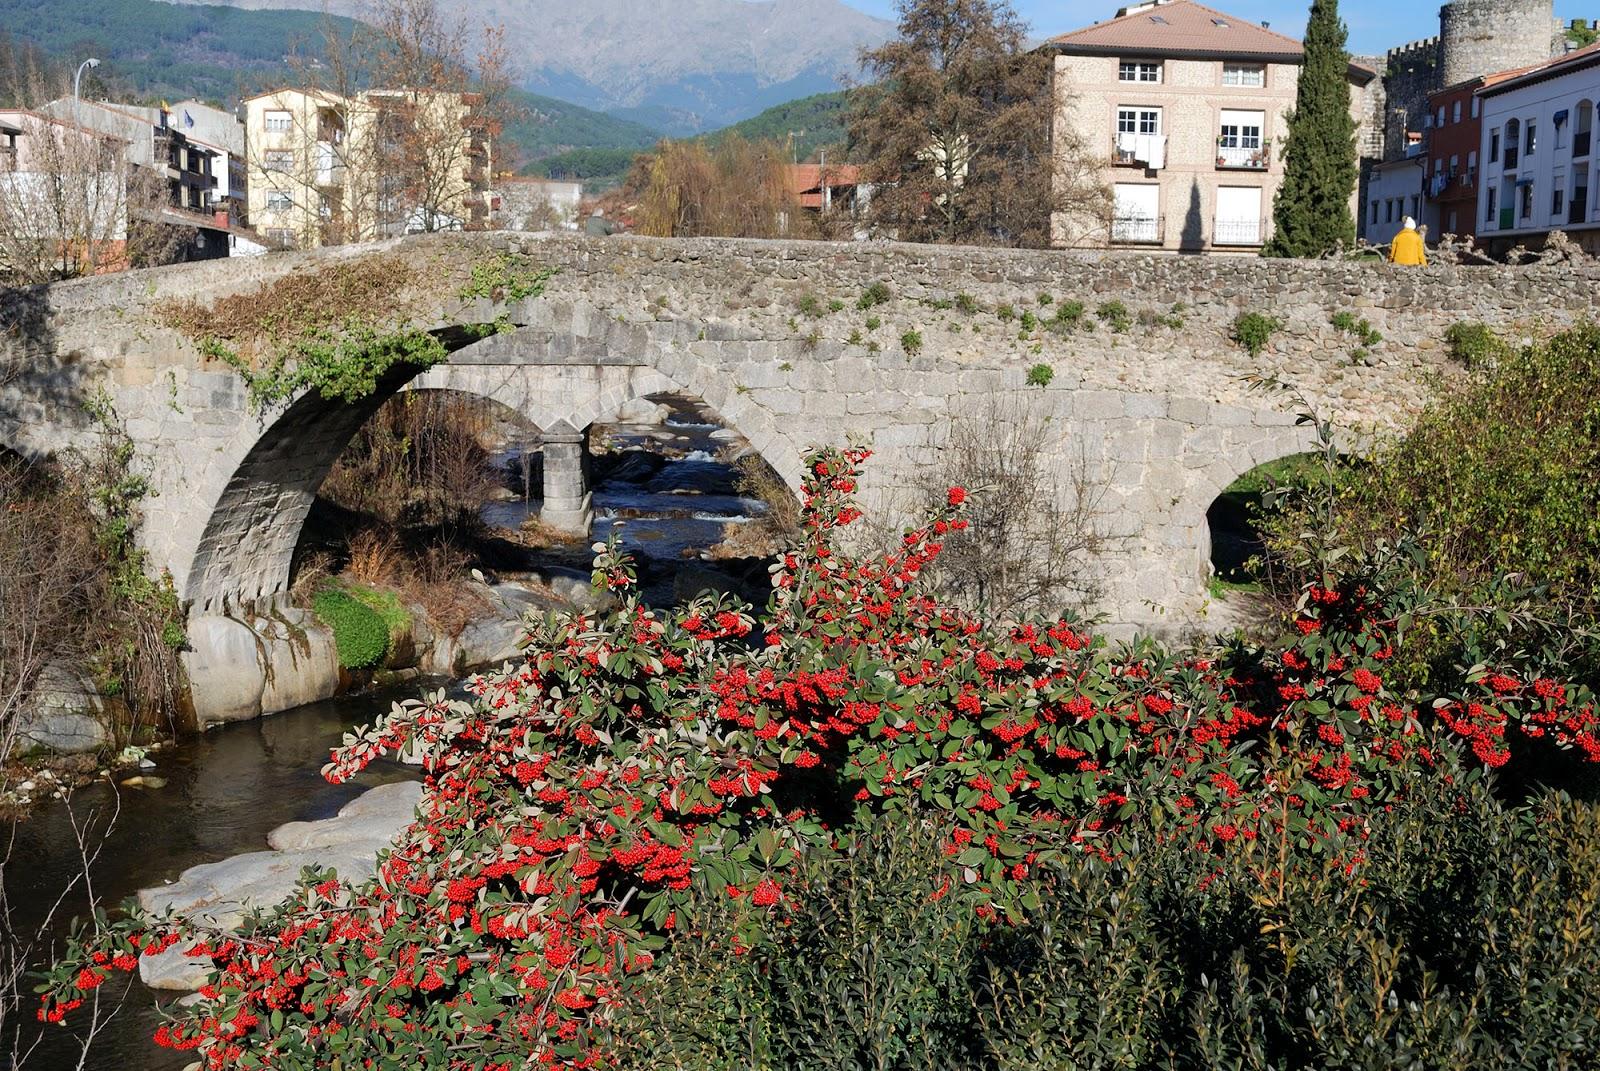 arenas san pedro bridge puente medieval avila valle tietar sierra gredos